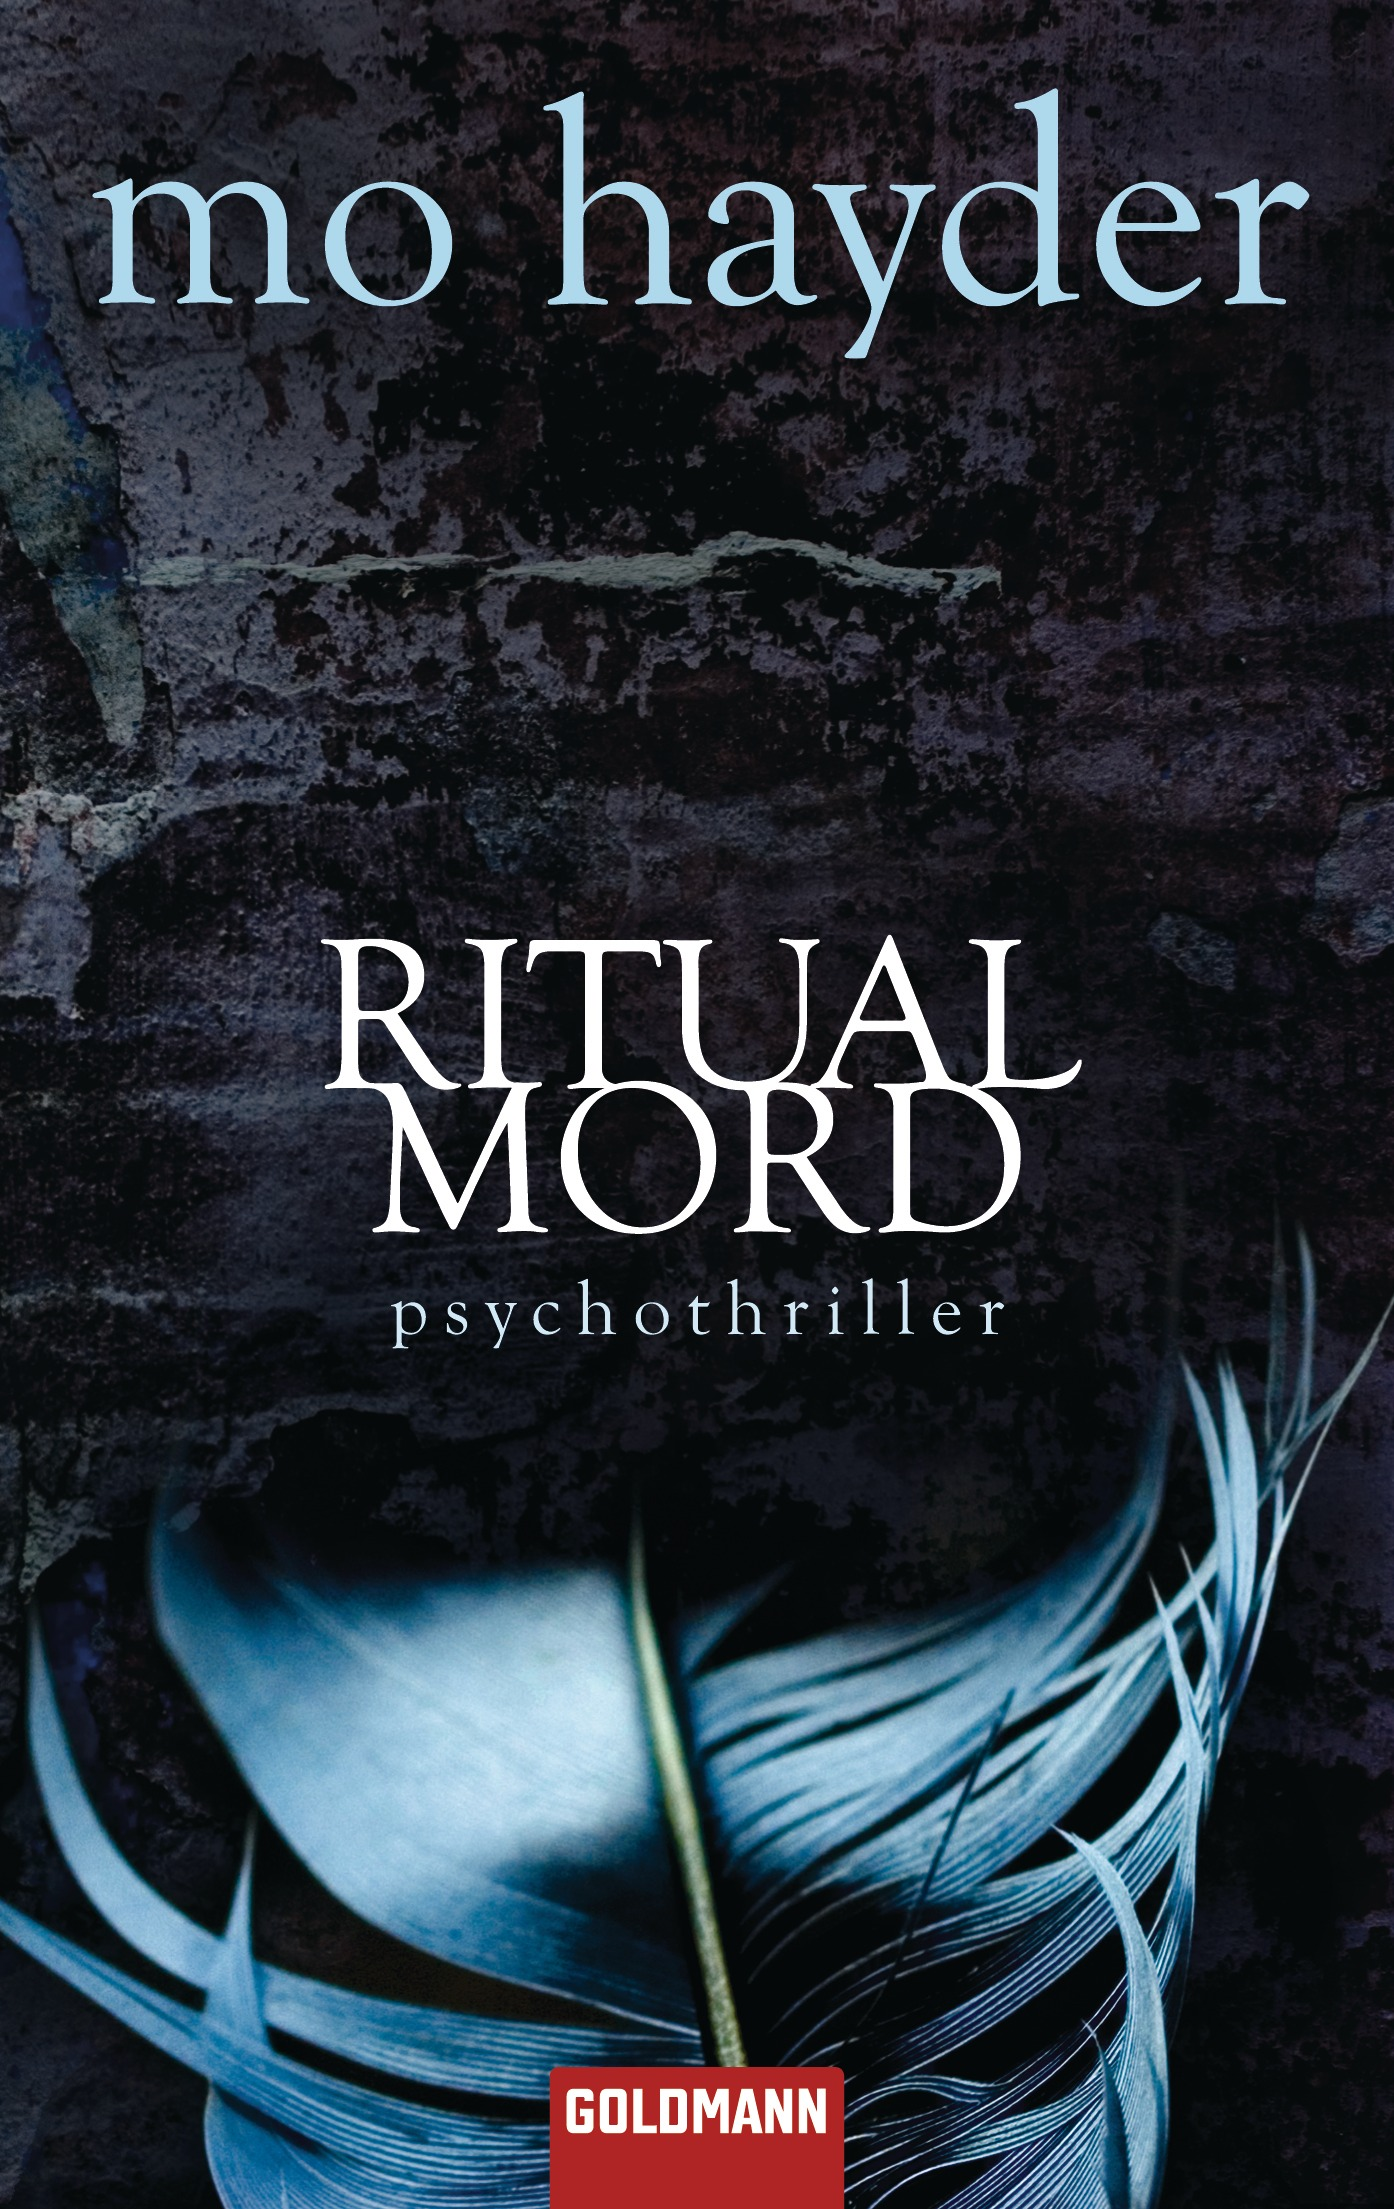 Ritualmord: Psychothriller - Mo Hayder